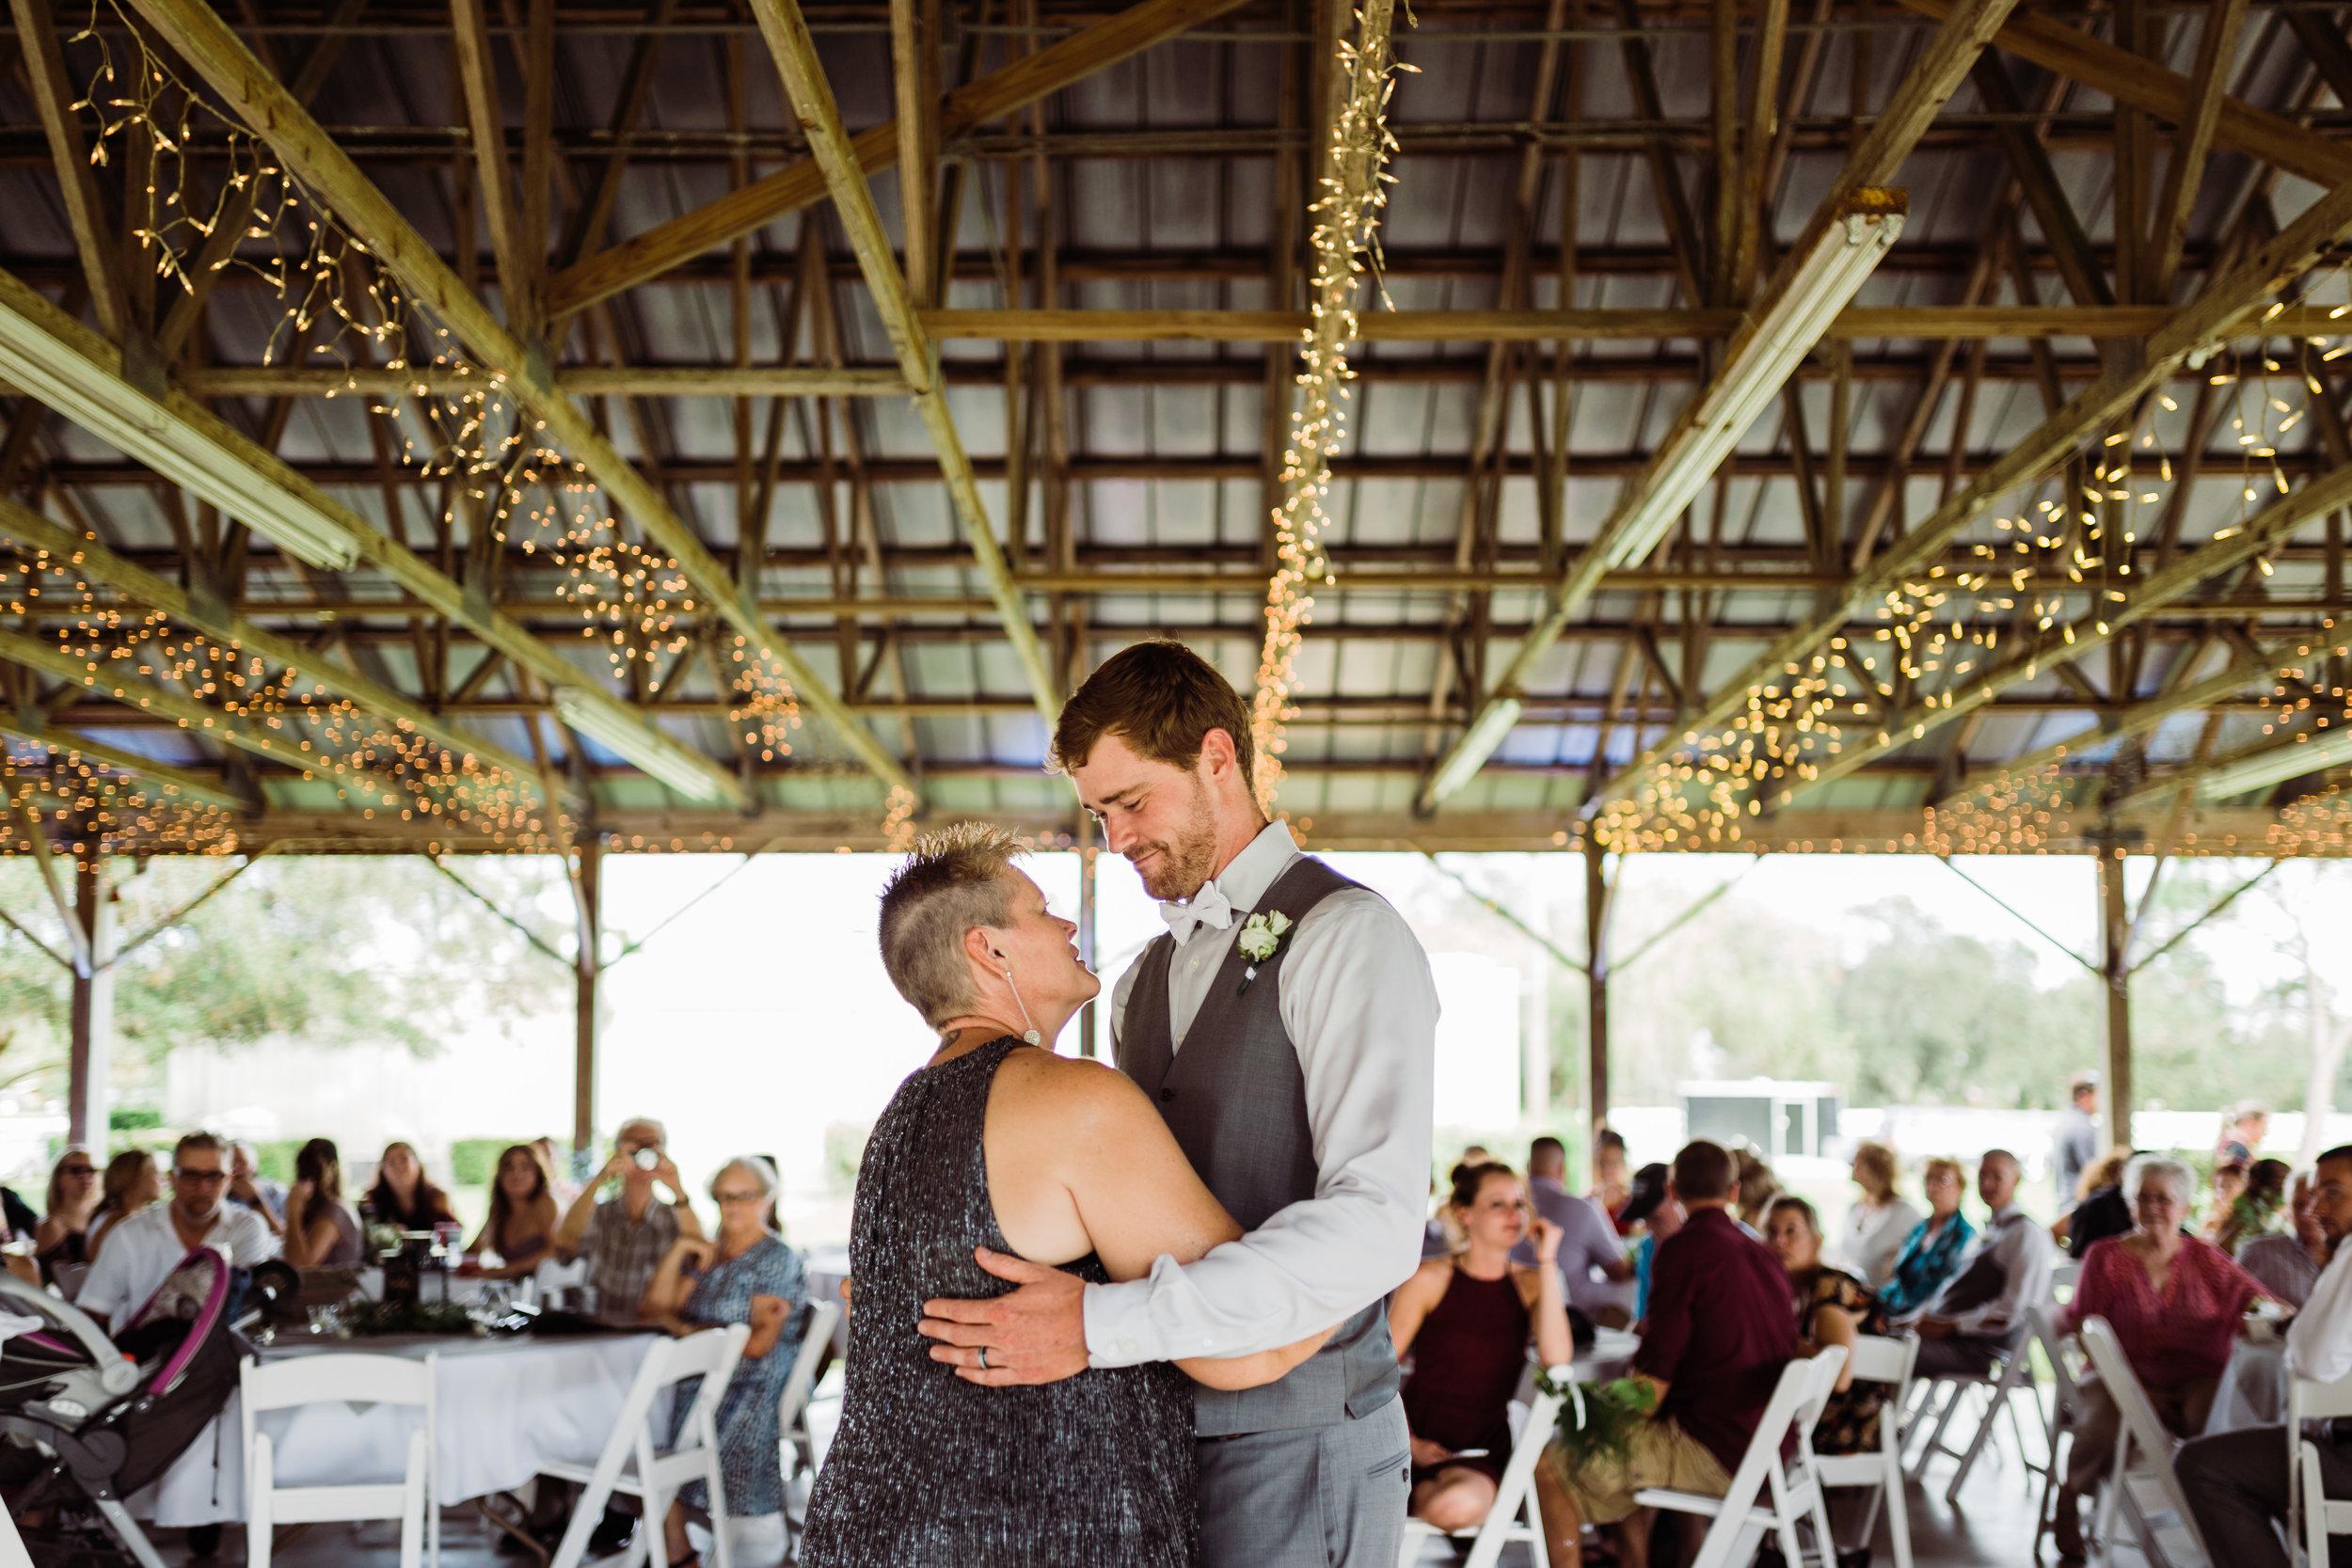 2017.10.14 Samantha and Matthew Crabtree Sarasota Wedding (473 of 708).jpg